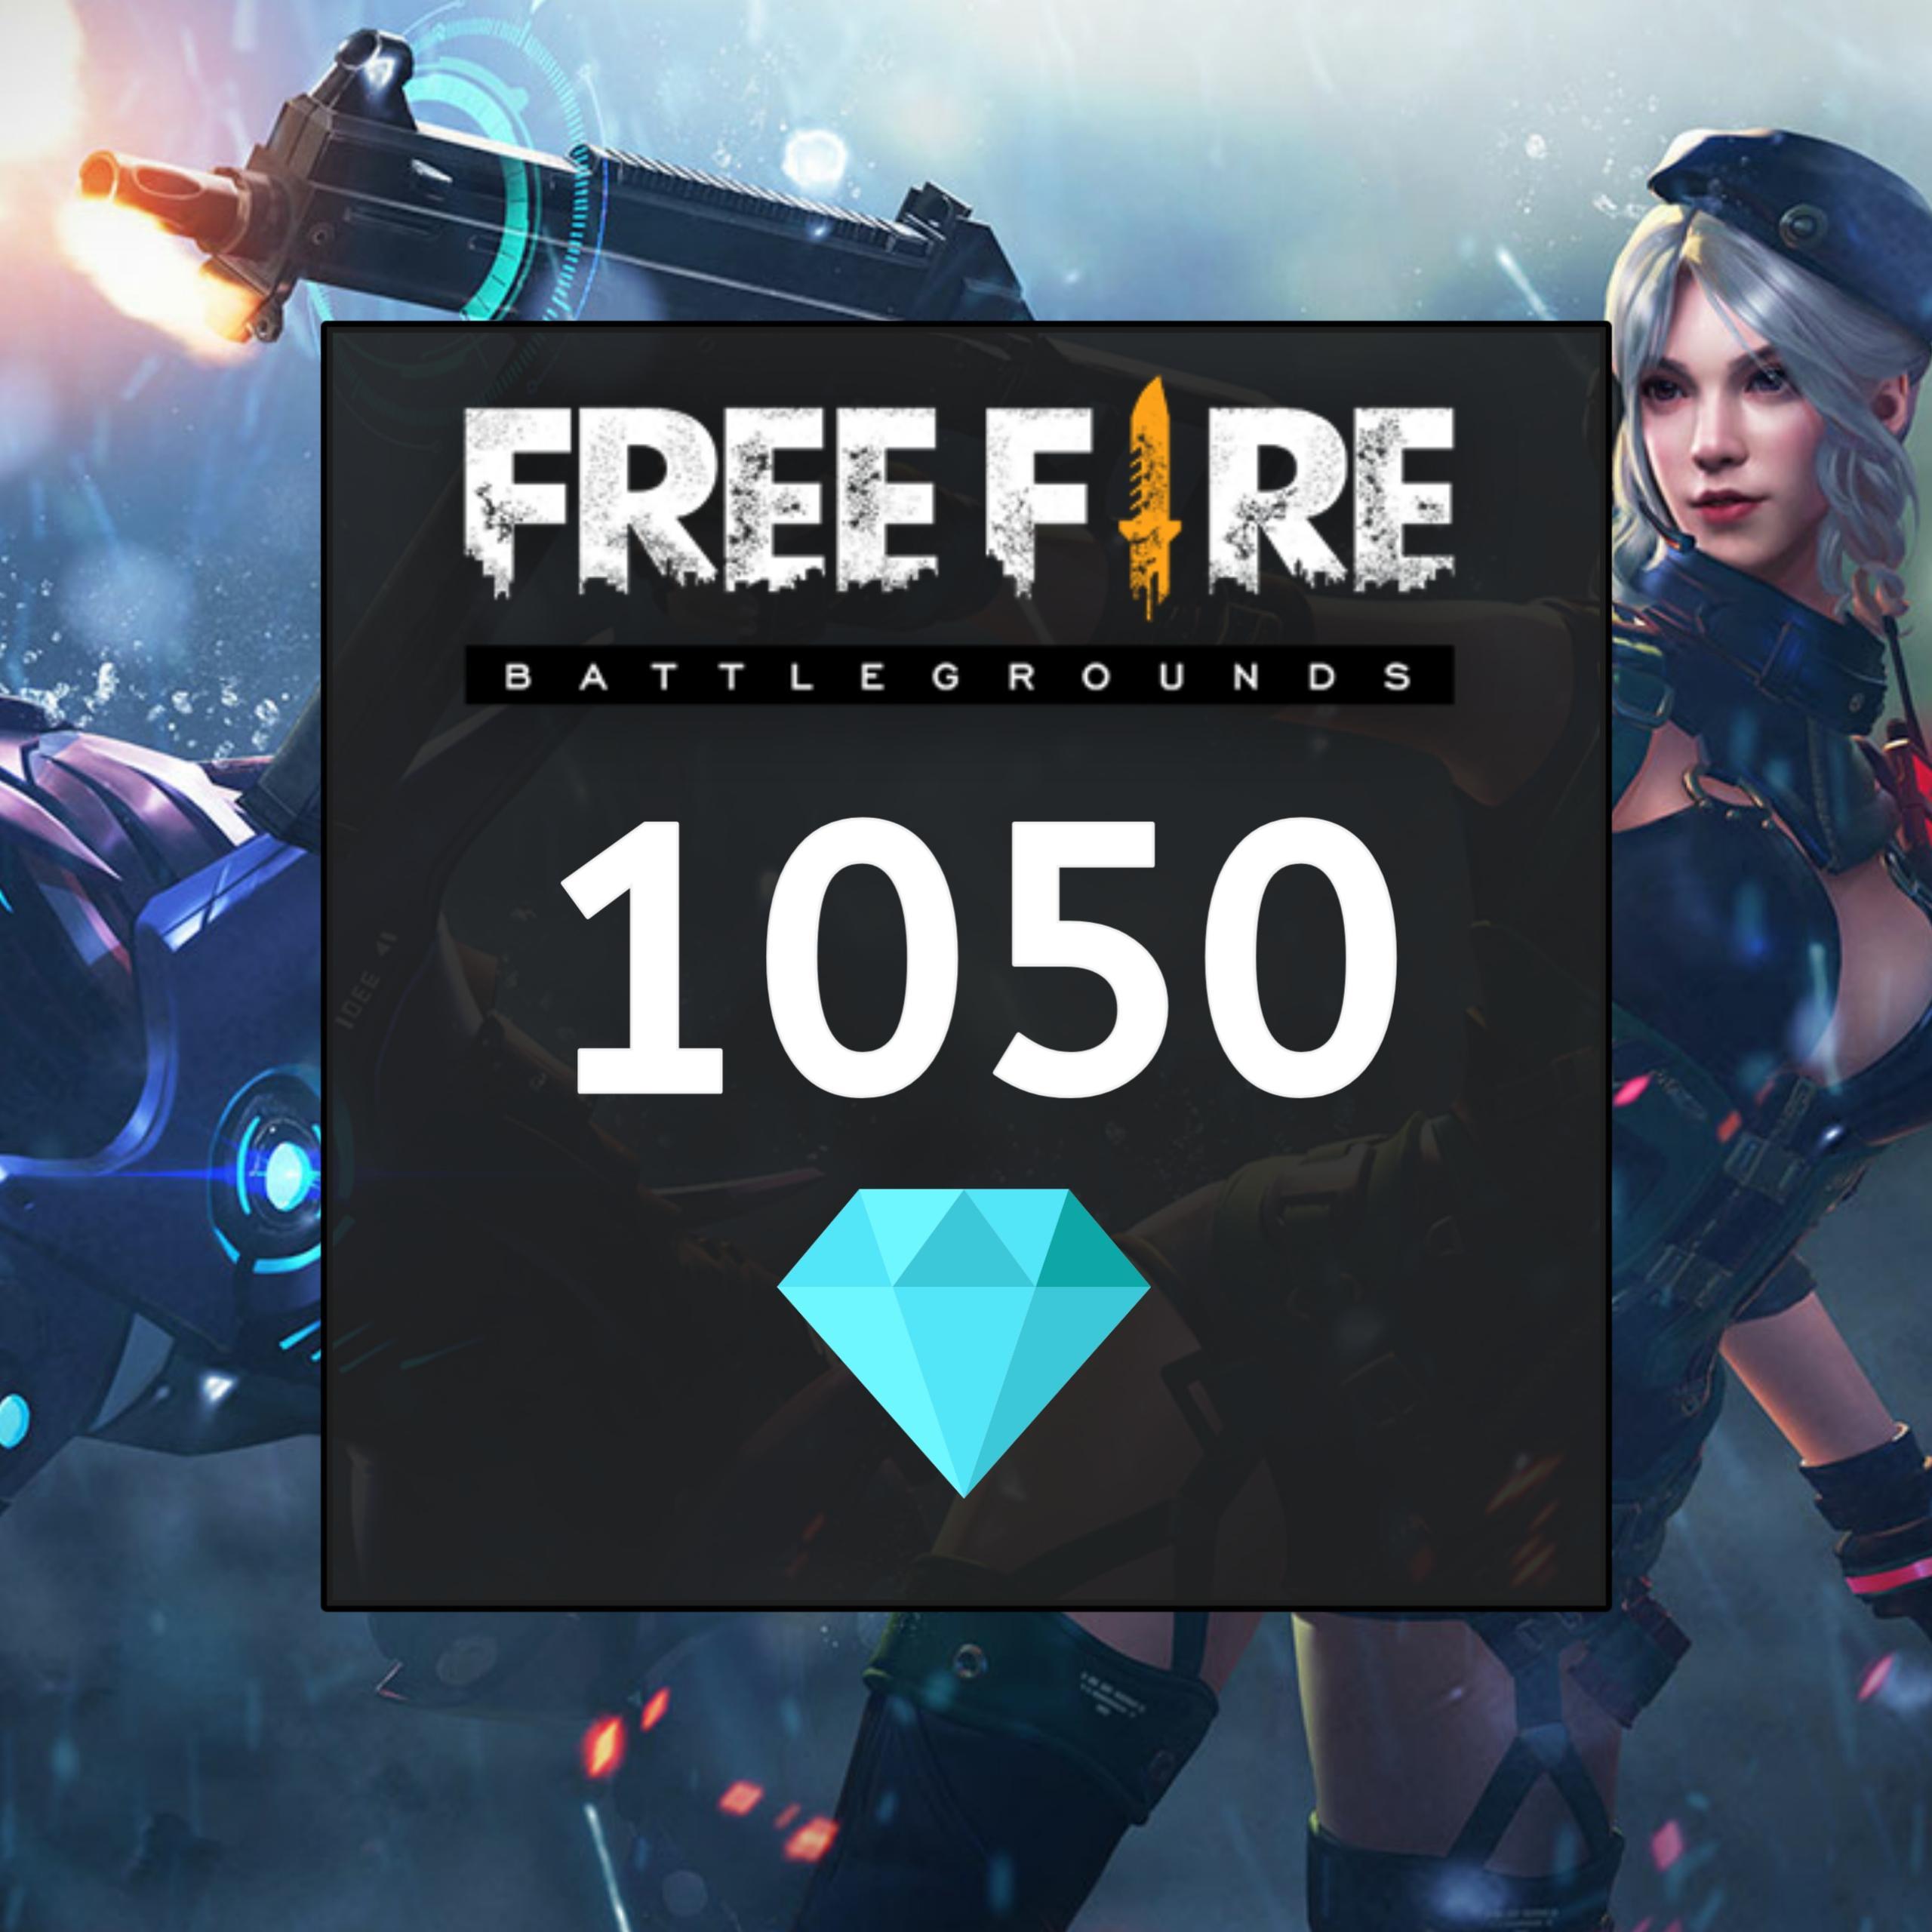 Top Up Garena Free Fire 1050 Diamonds [Via ID]